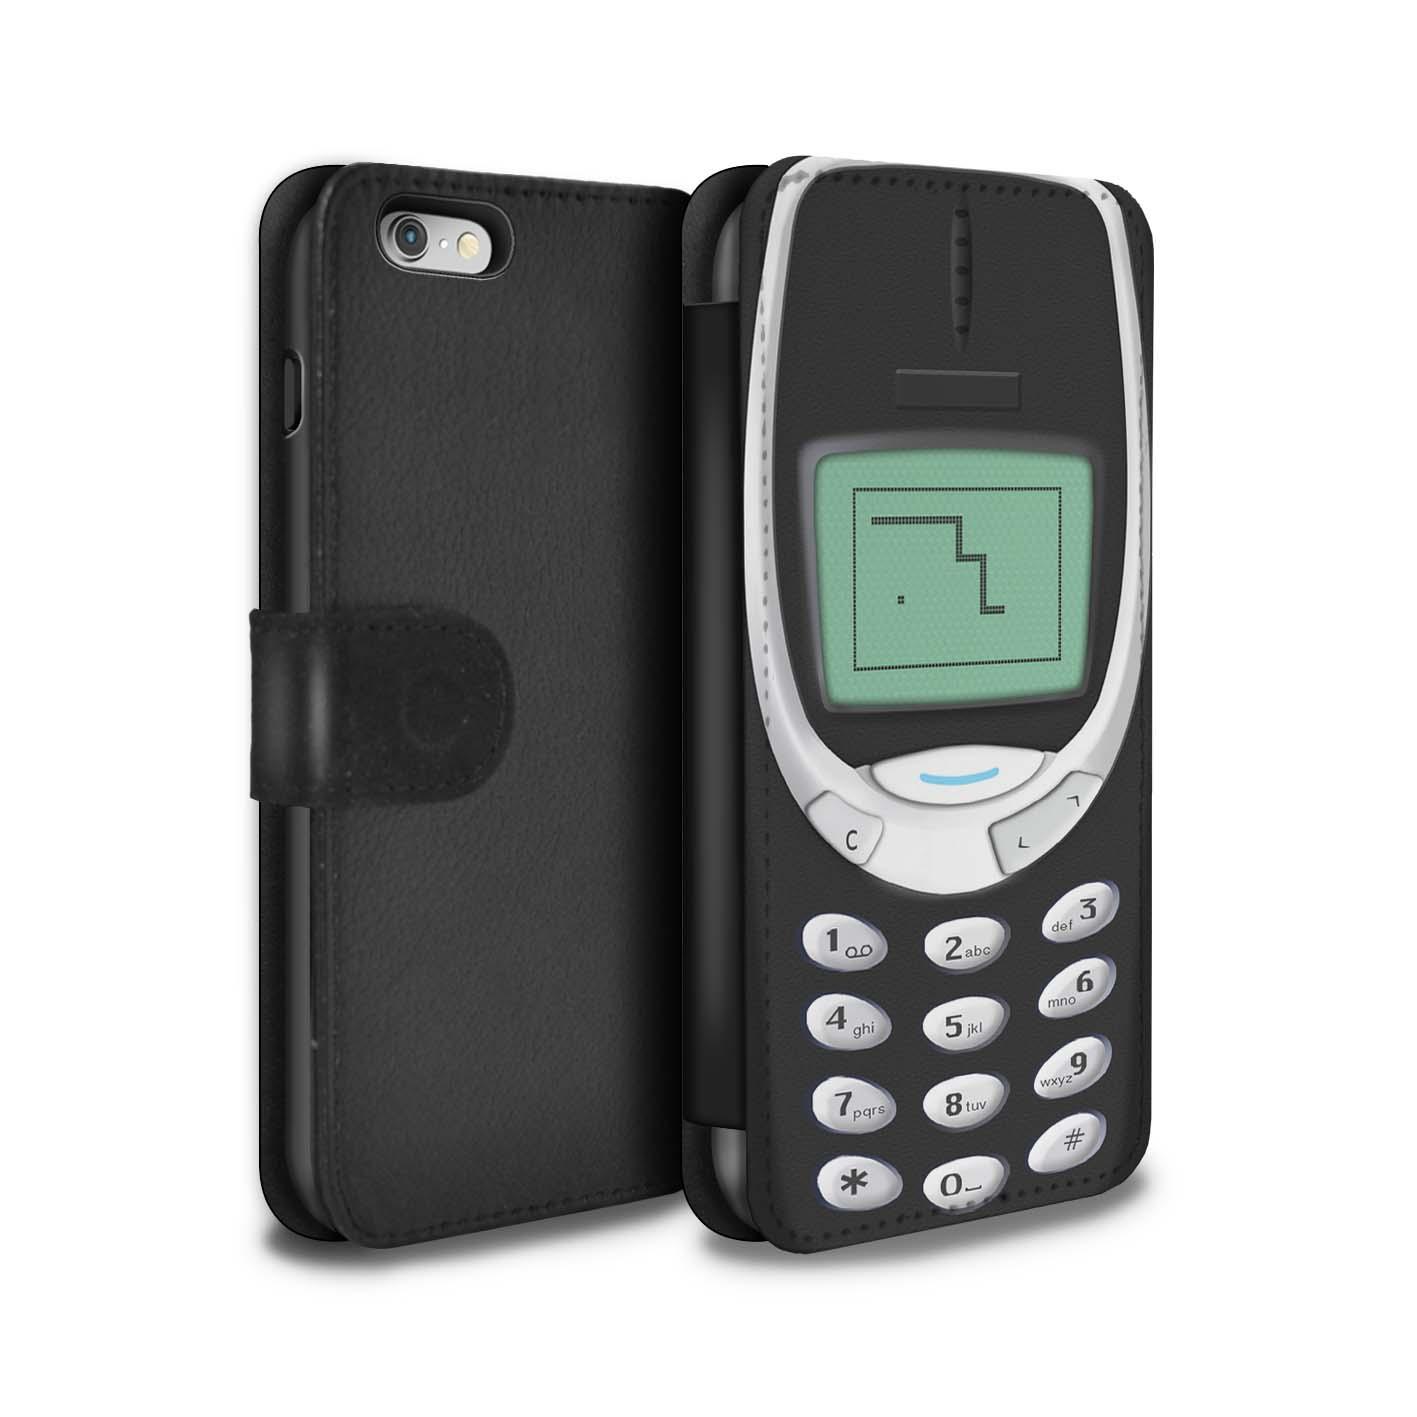 STUFF4-Coque-Etui-Case-Cuir-PU-pour-Apple-iPhone-6-Portables-retro